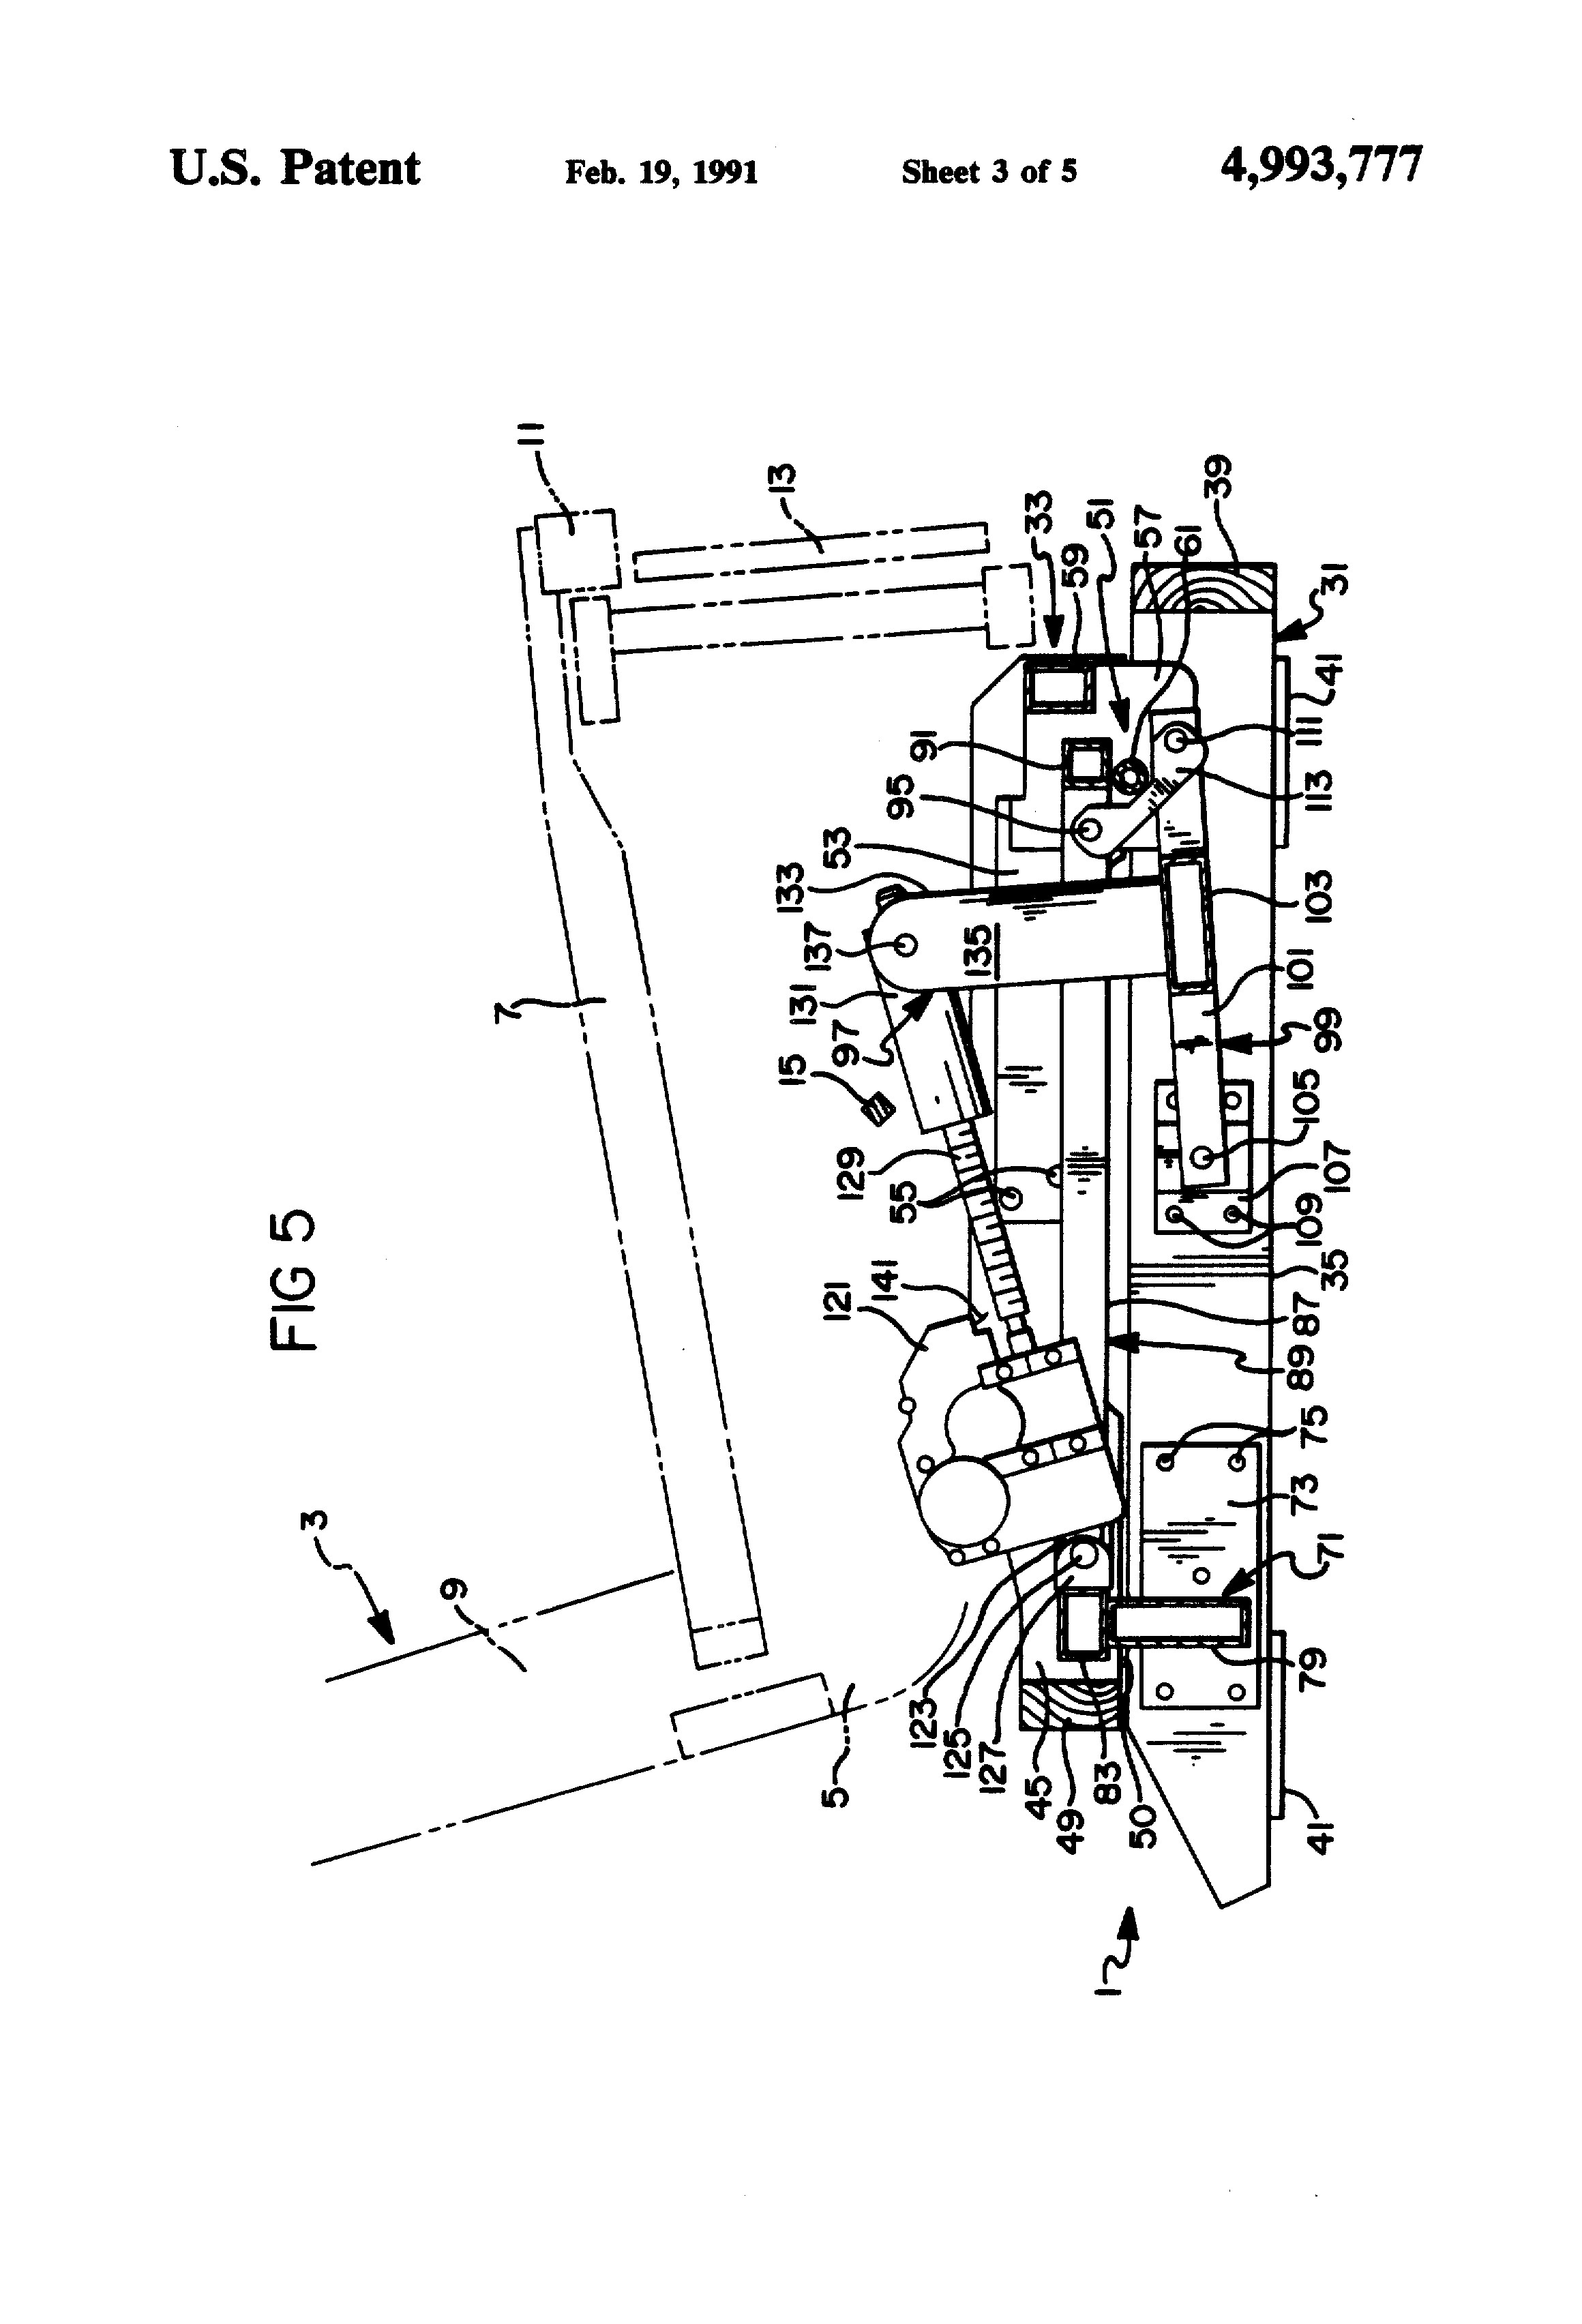 telstra lift wiring diagrams